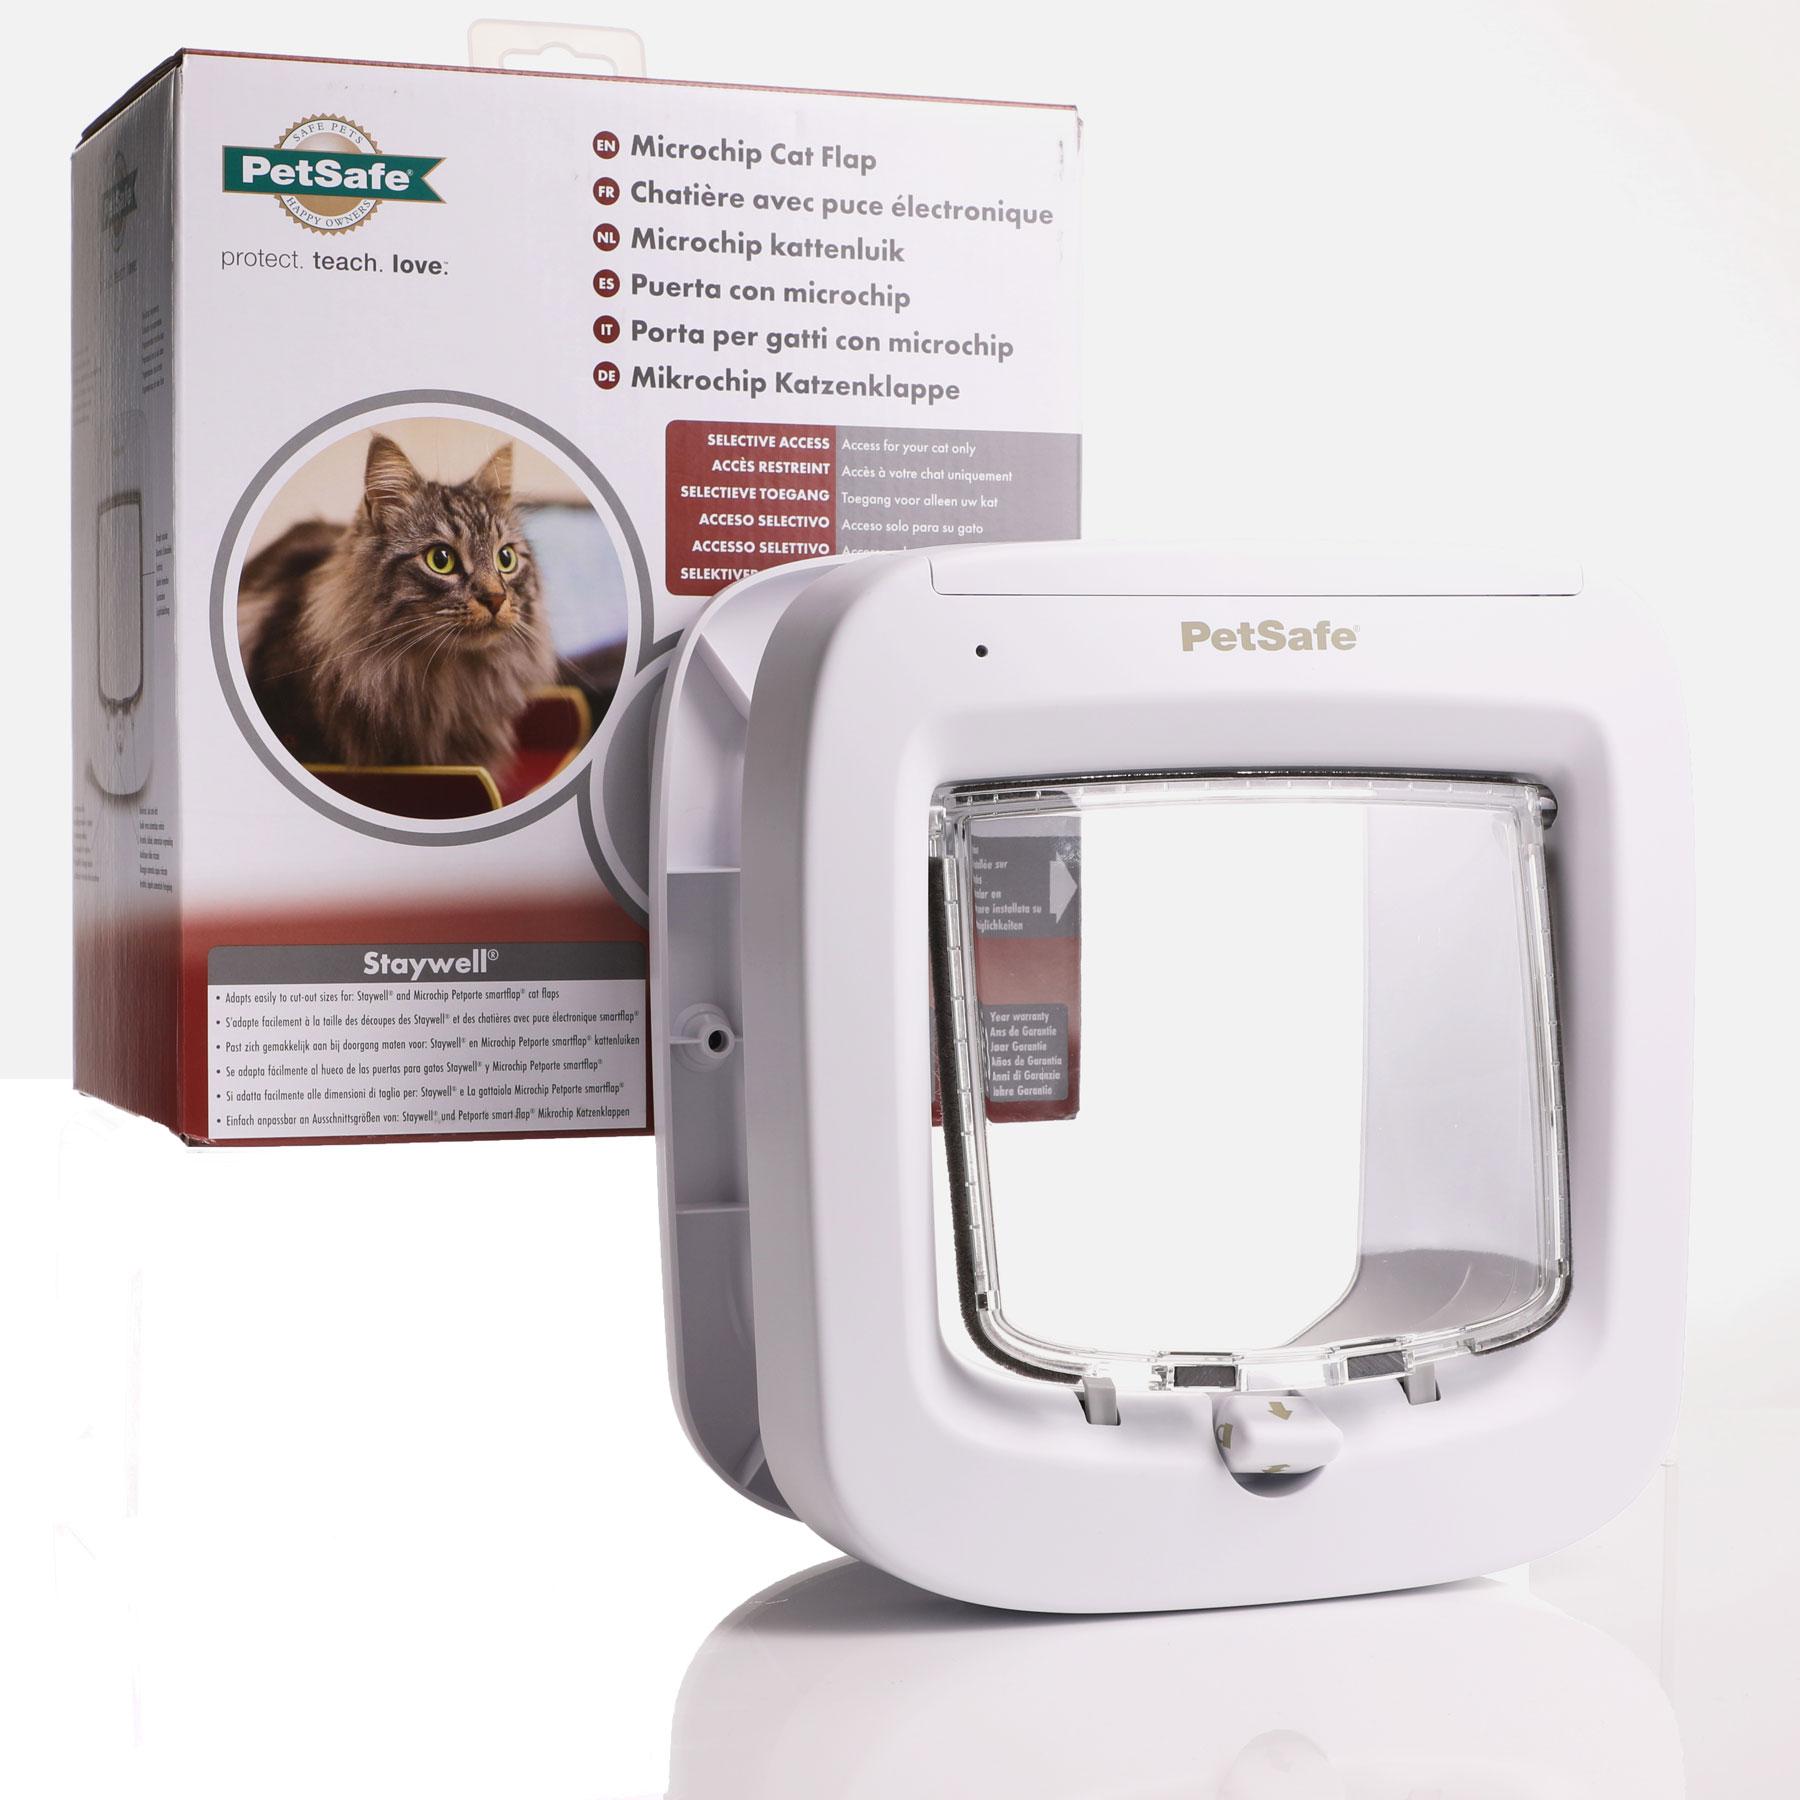 Microchip cat flap door in white from PetSafe Staywell